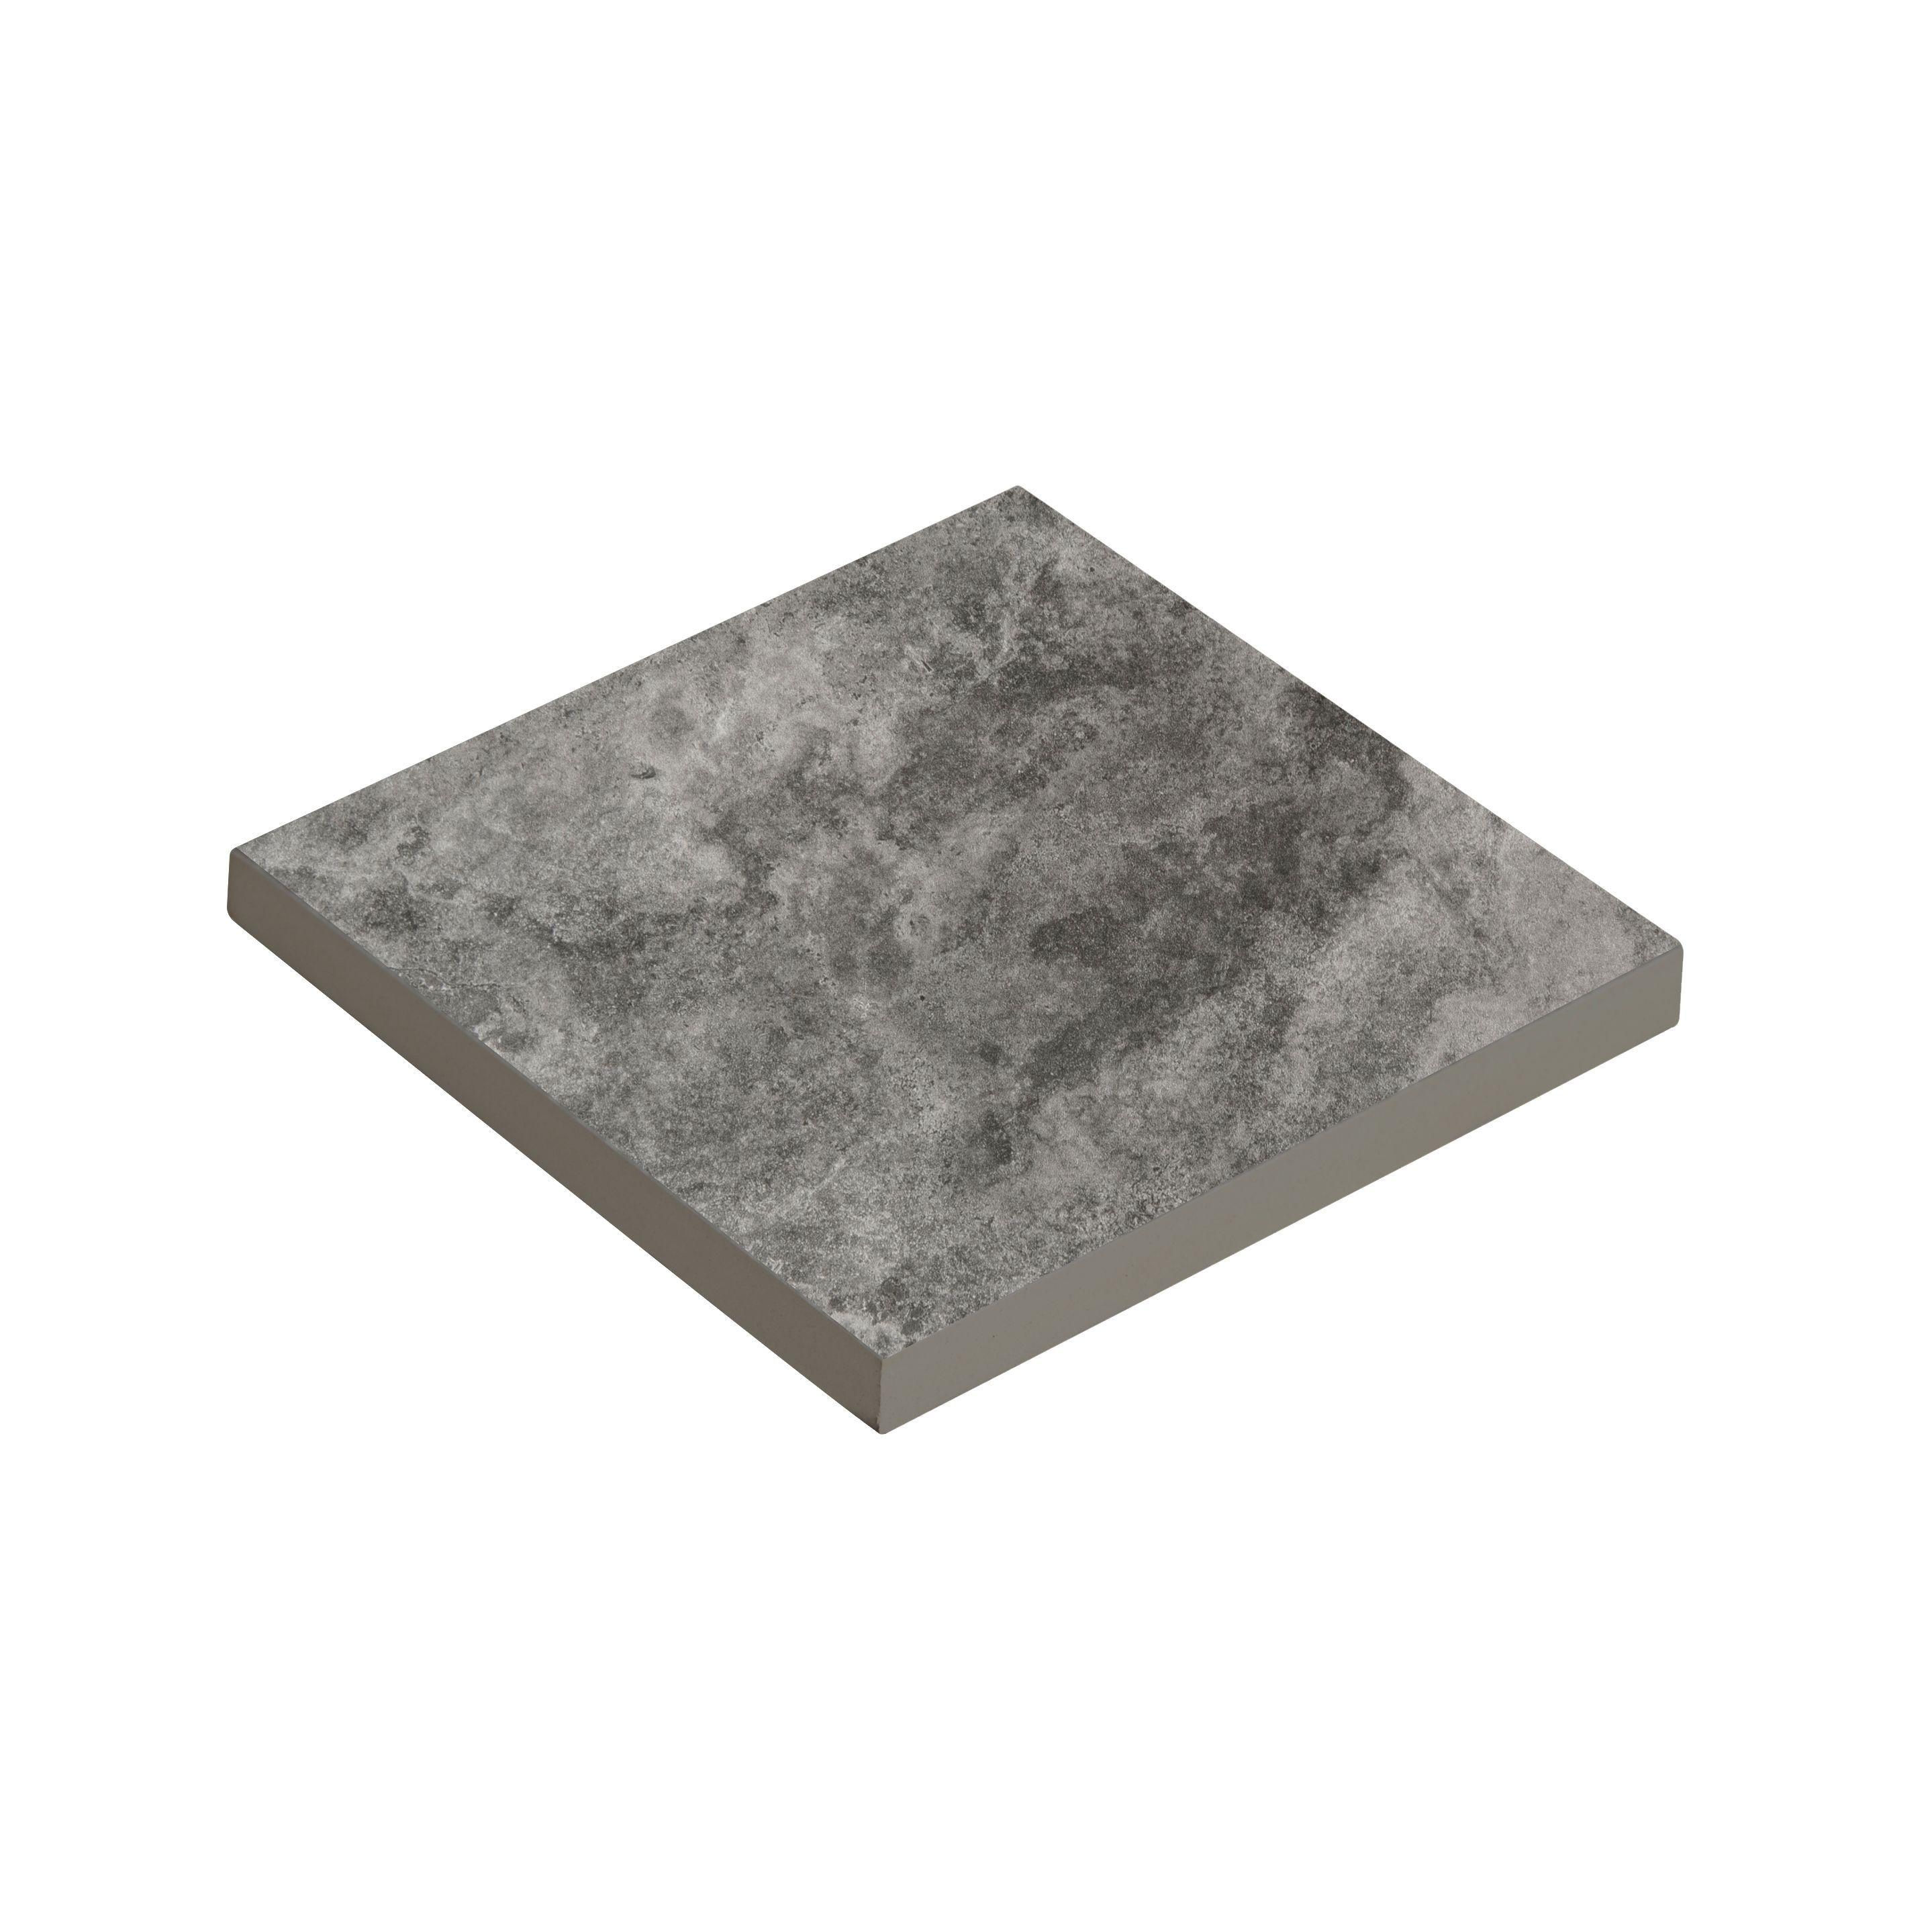 Oscano Graphite Stone Effect Ceramic Wall Floor Tile: Oscano Dark Grey Graphite Stone Effect Ceramic Sample Tile